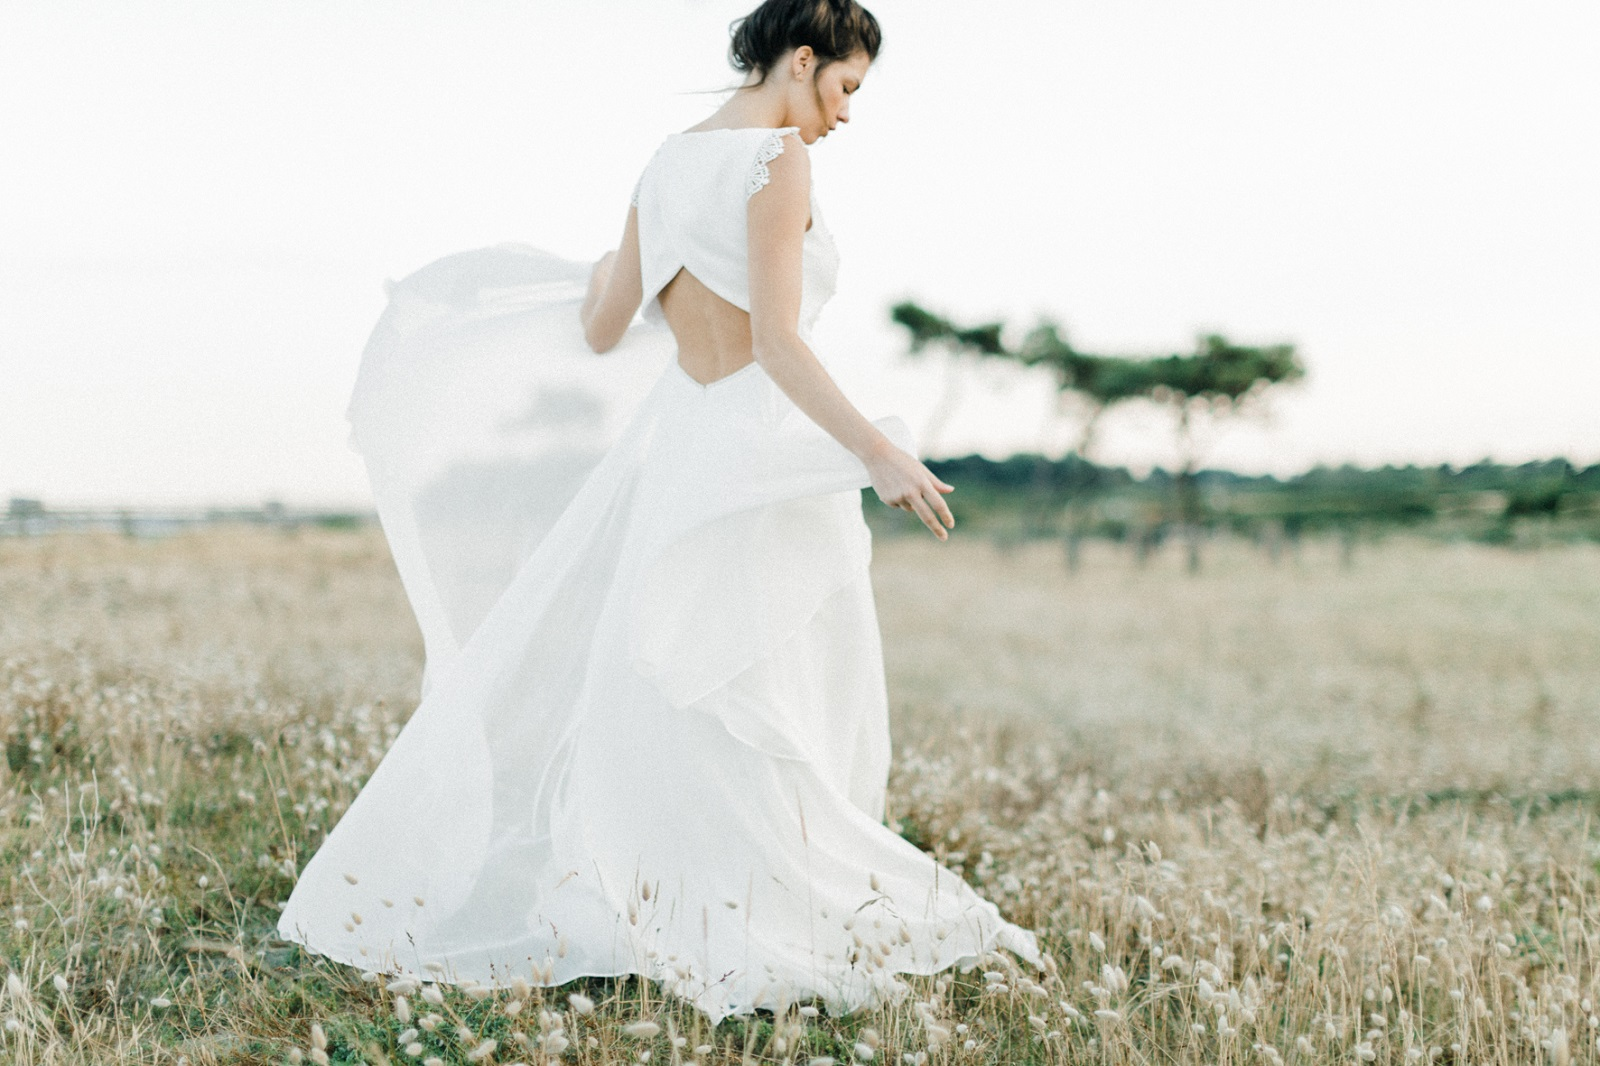 creatrice robe mariee sur mesure Nantes